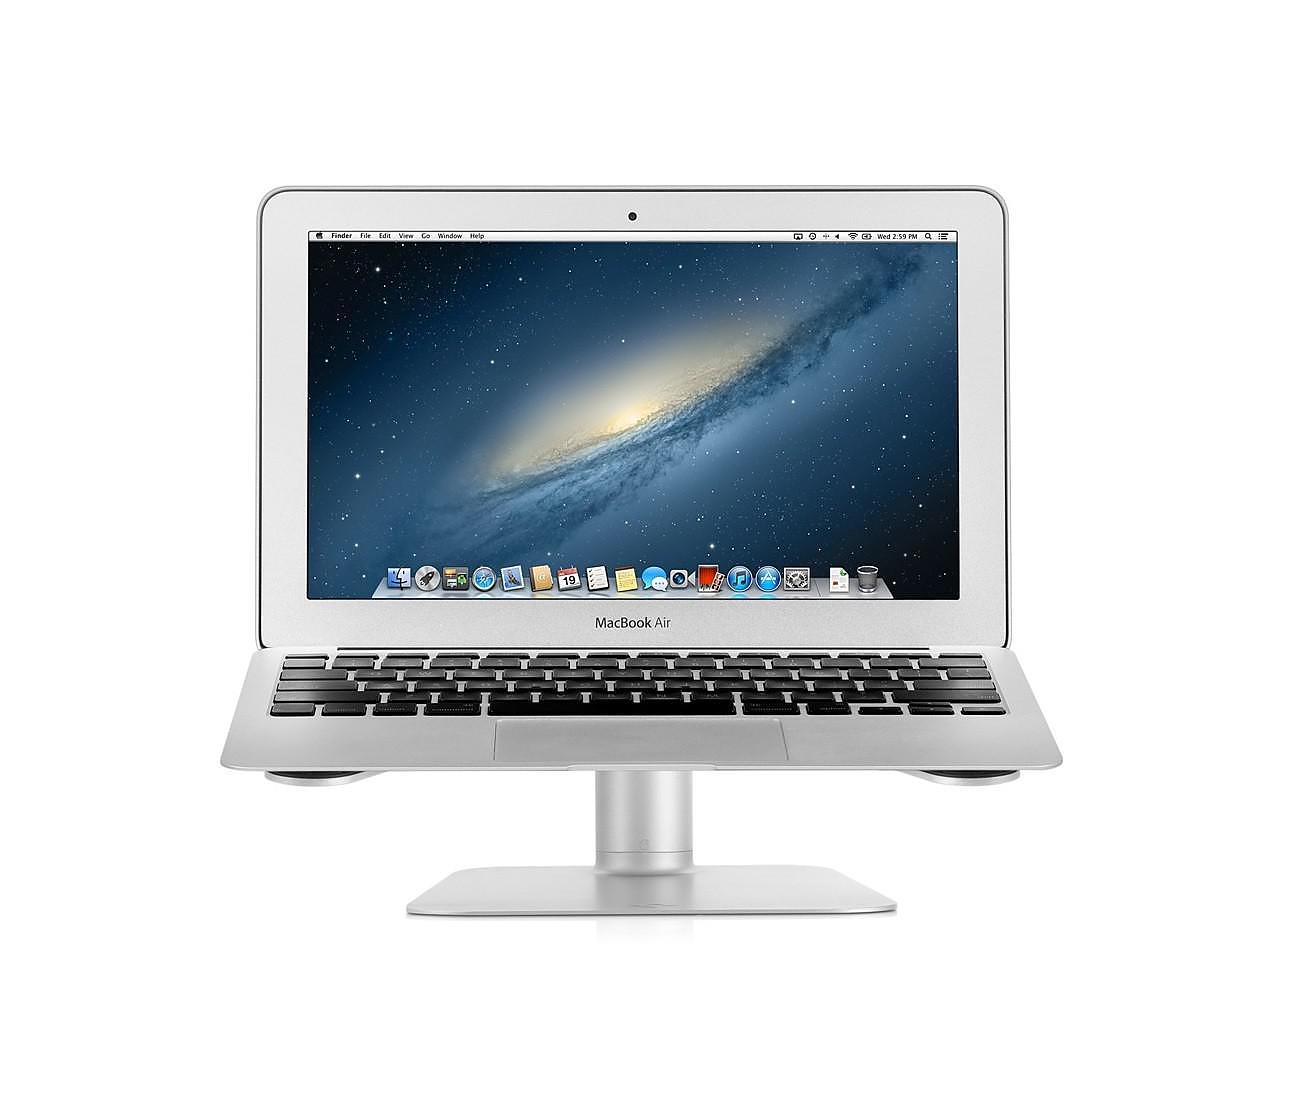 Hirise Adjustable Macbook Stand By Twelve South Design